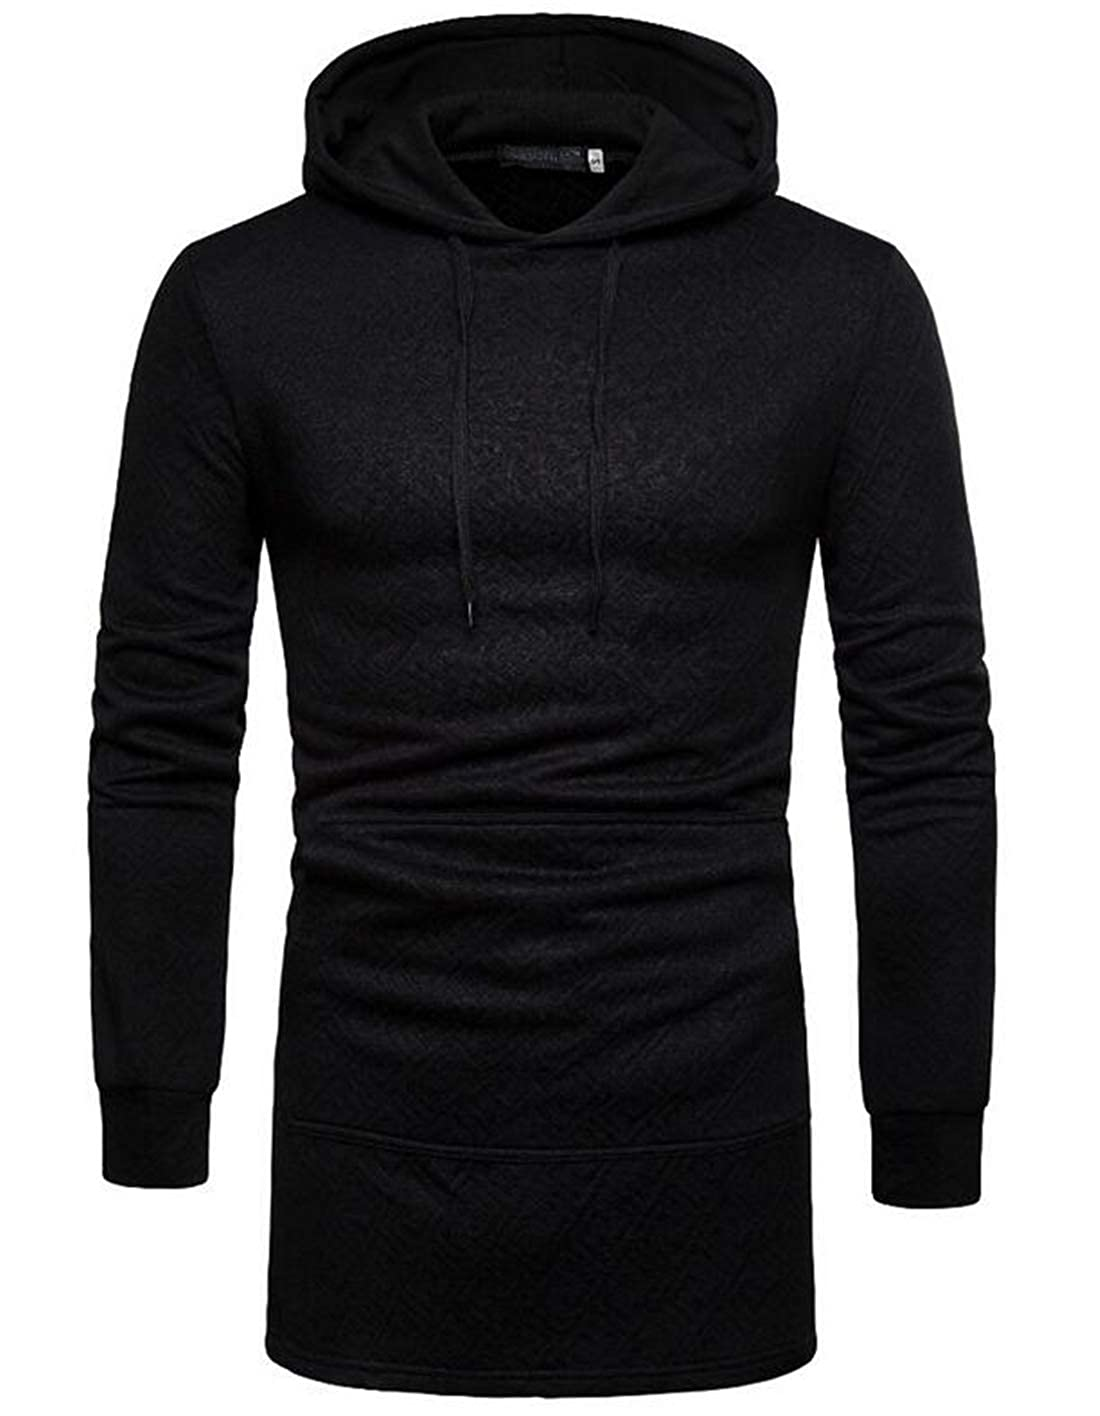 Spirio Mens Casual Long Sleeve Hooded Drawstring Patchwork Camo Print Pullover Sweatshirt